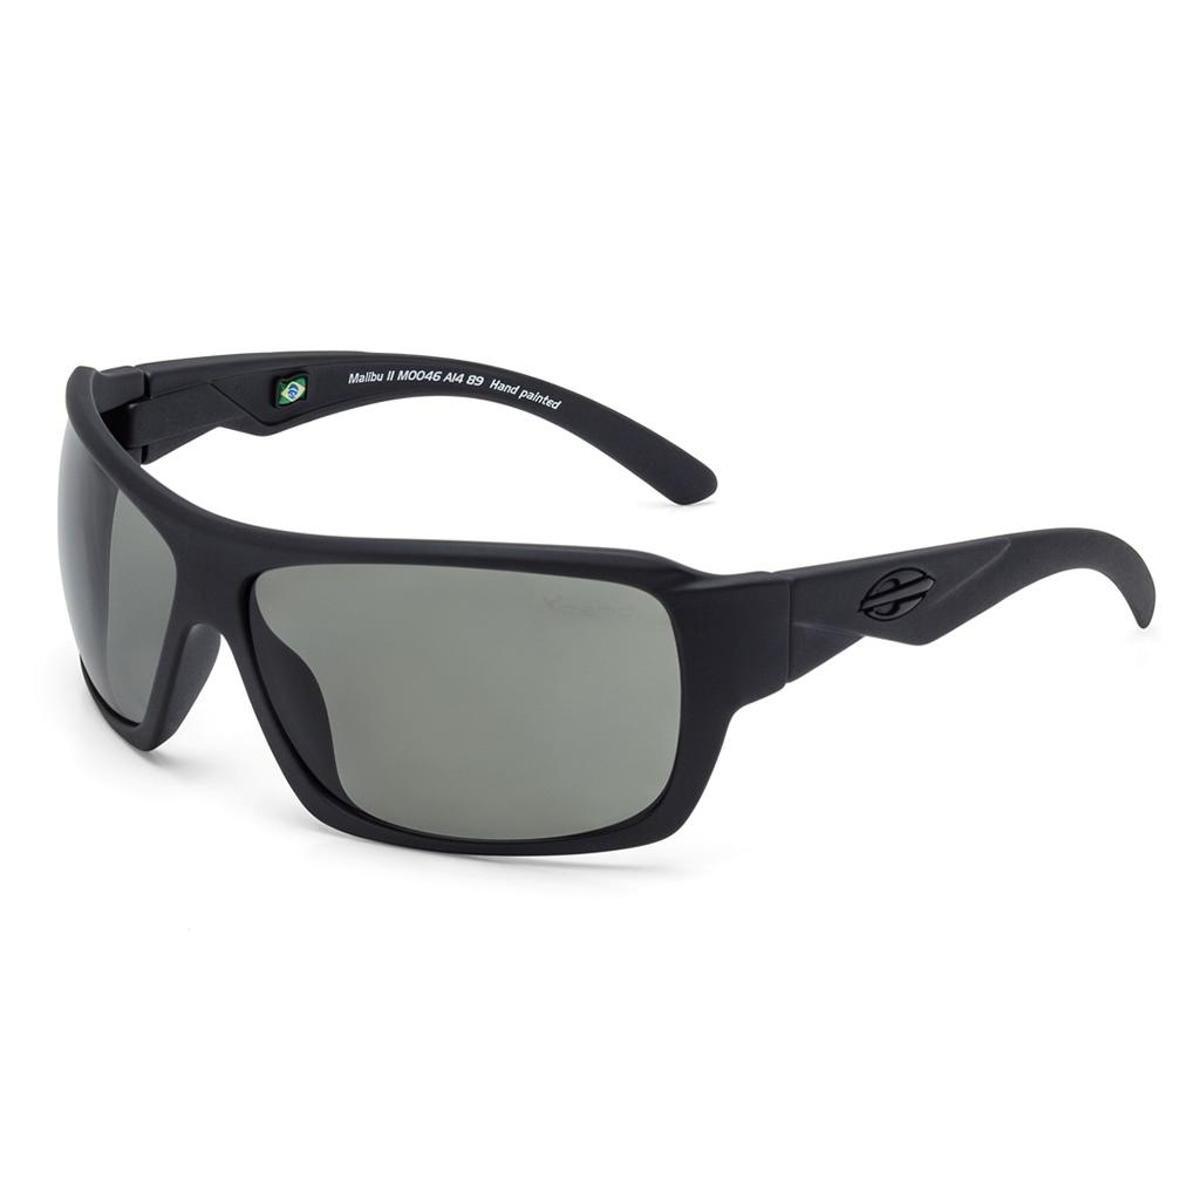 50235f58703aa Óculos Sol Mormaii Malibu 2 M0046a1489 Preto Fosco - Compre Agora ...